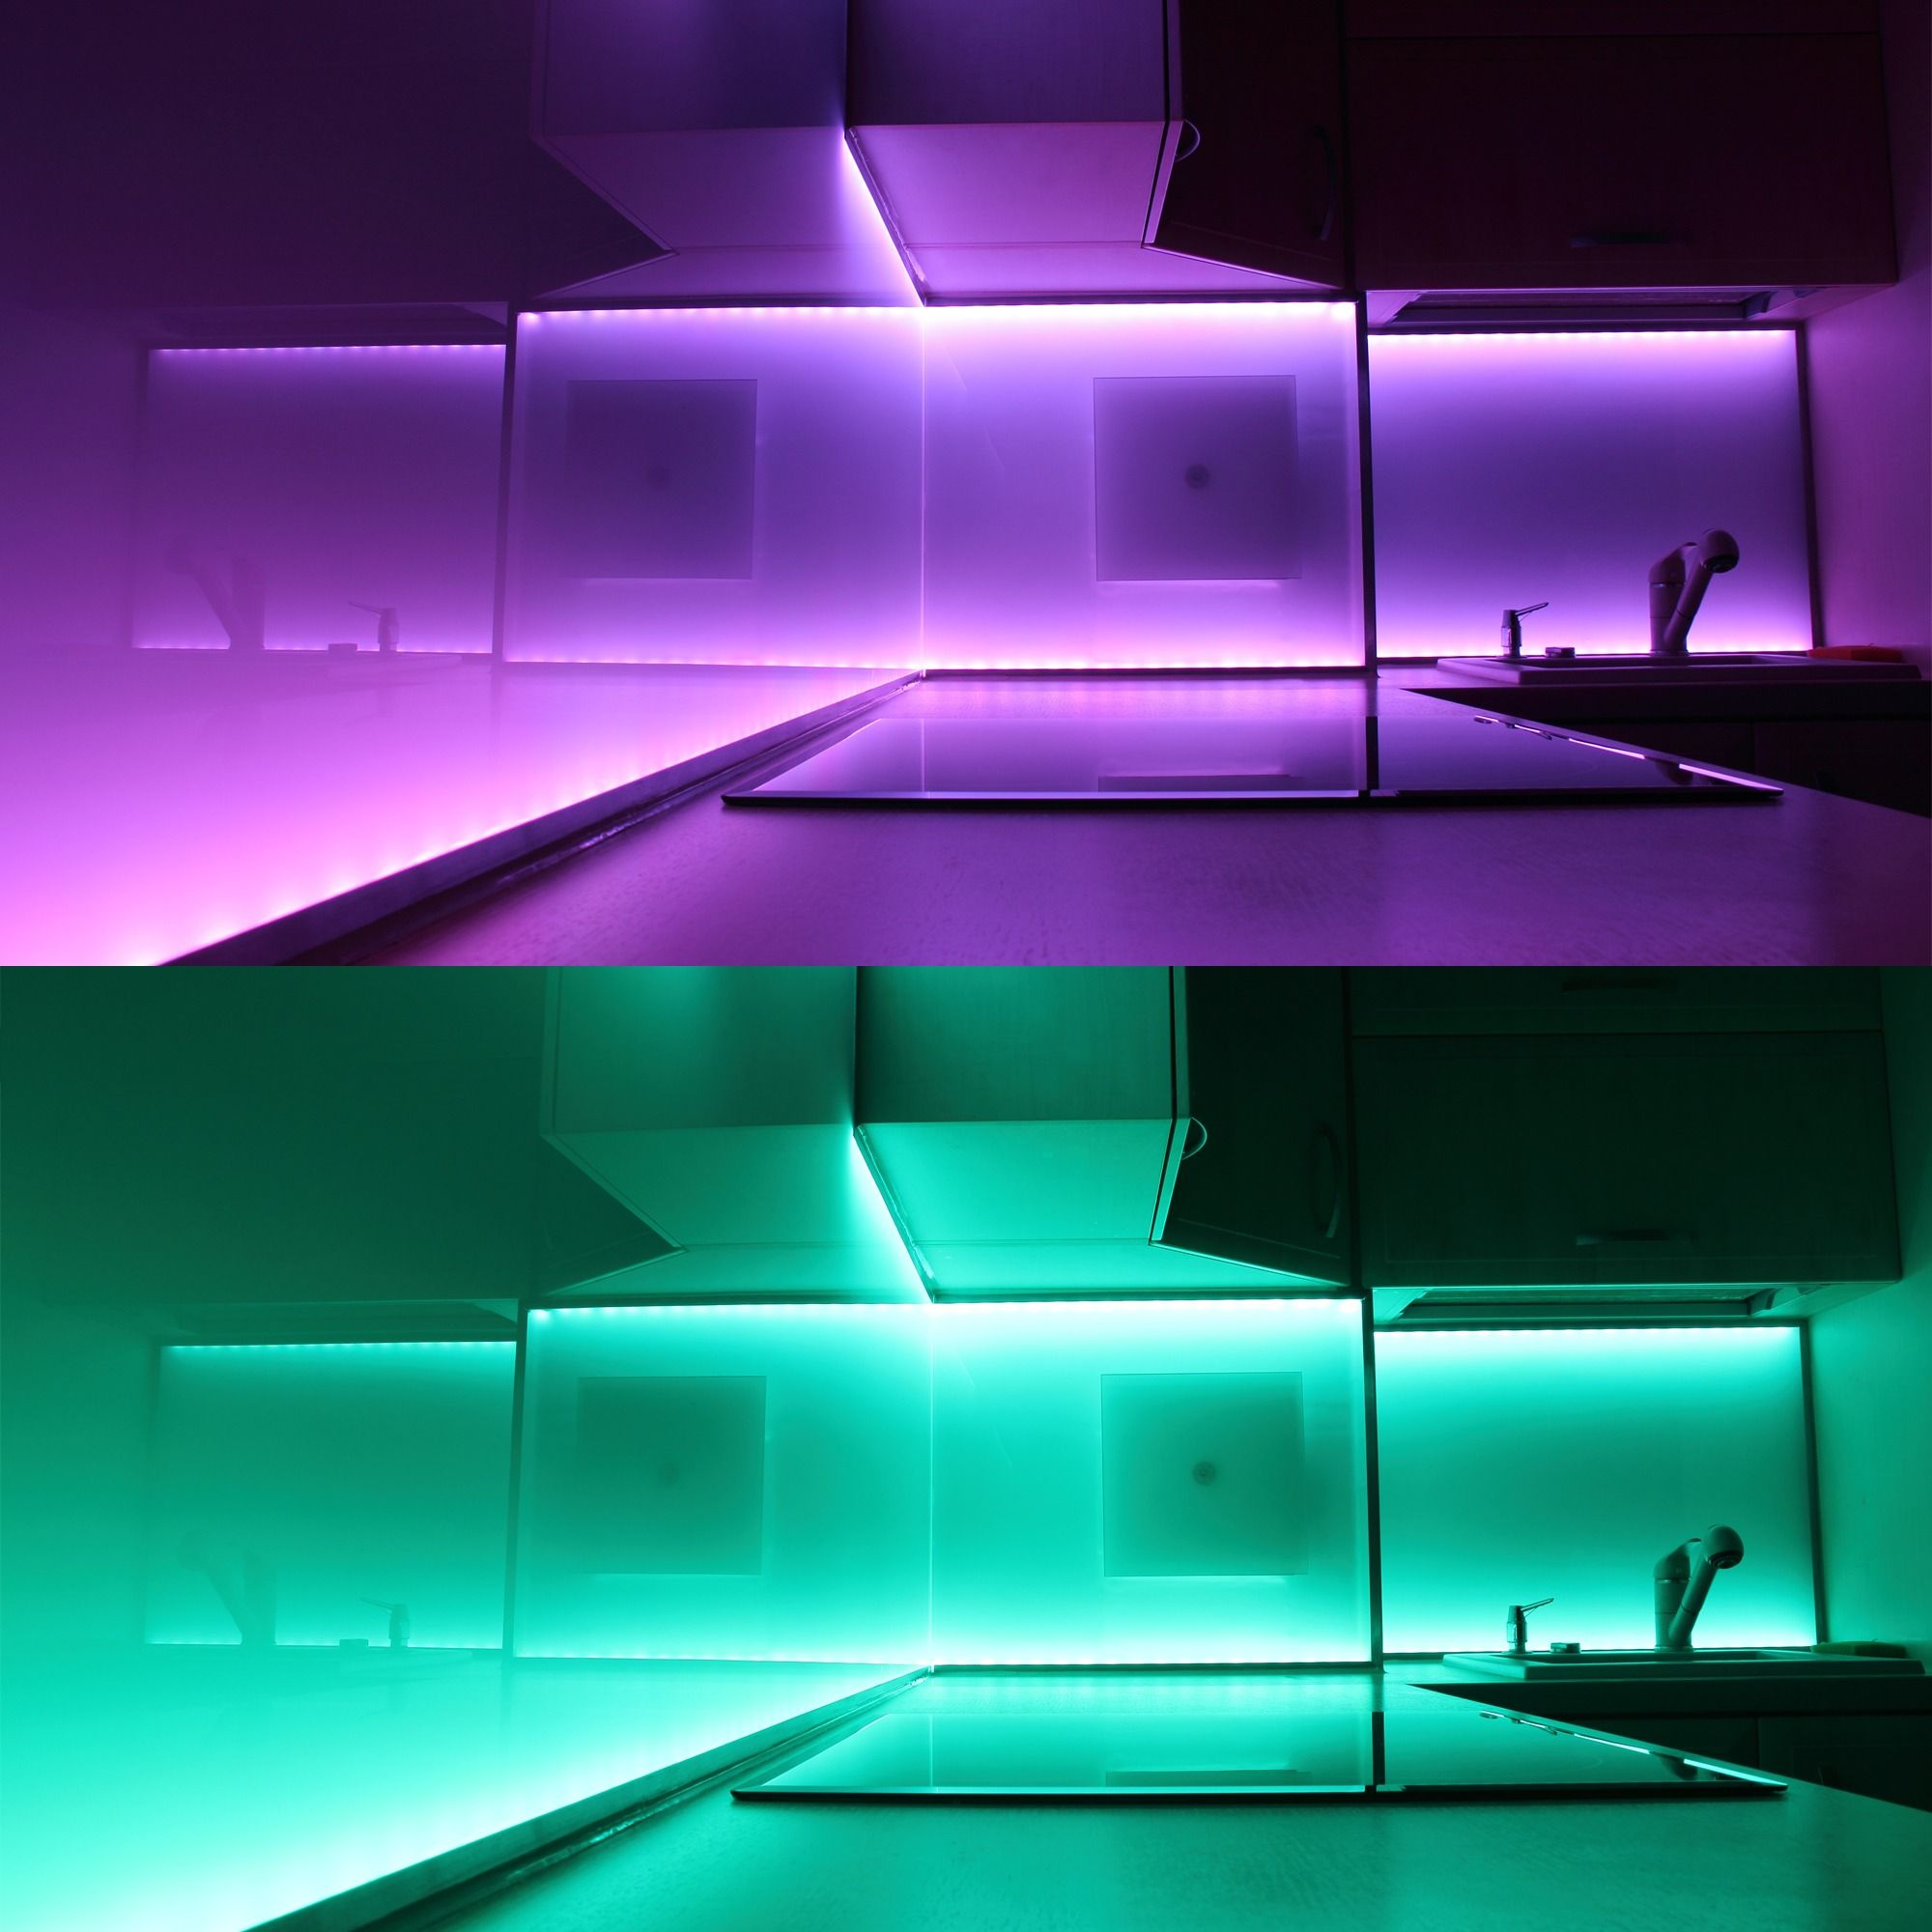 Was Ist Deine Lieblingsfarbe Led Lichtleiste Led Lichtband Led Stripes